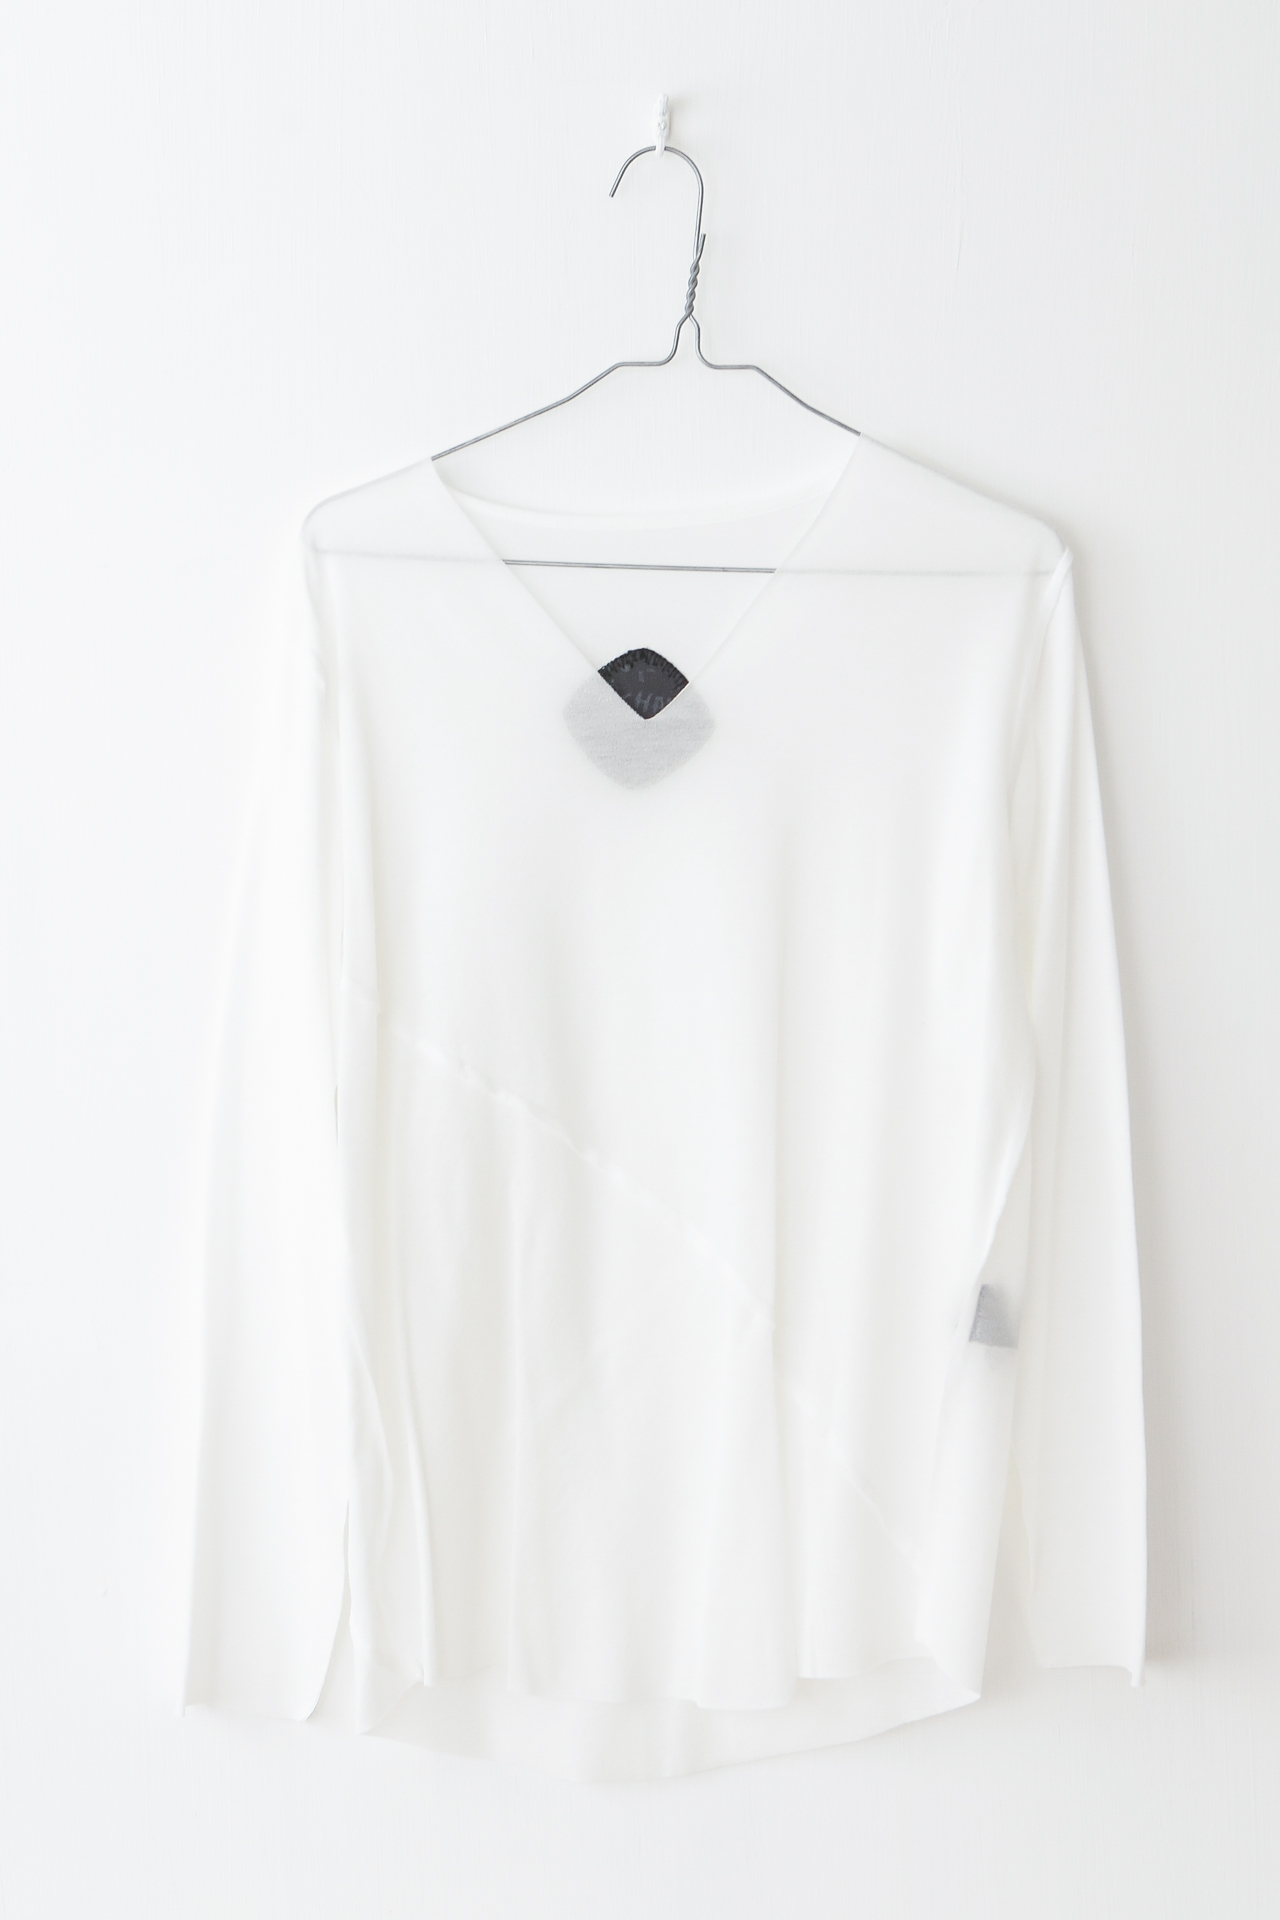 T-shirt【COTTON コットン】WHITECS2113[税/送料込み][受注生産]